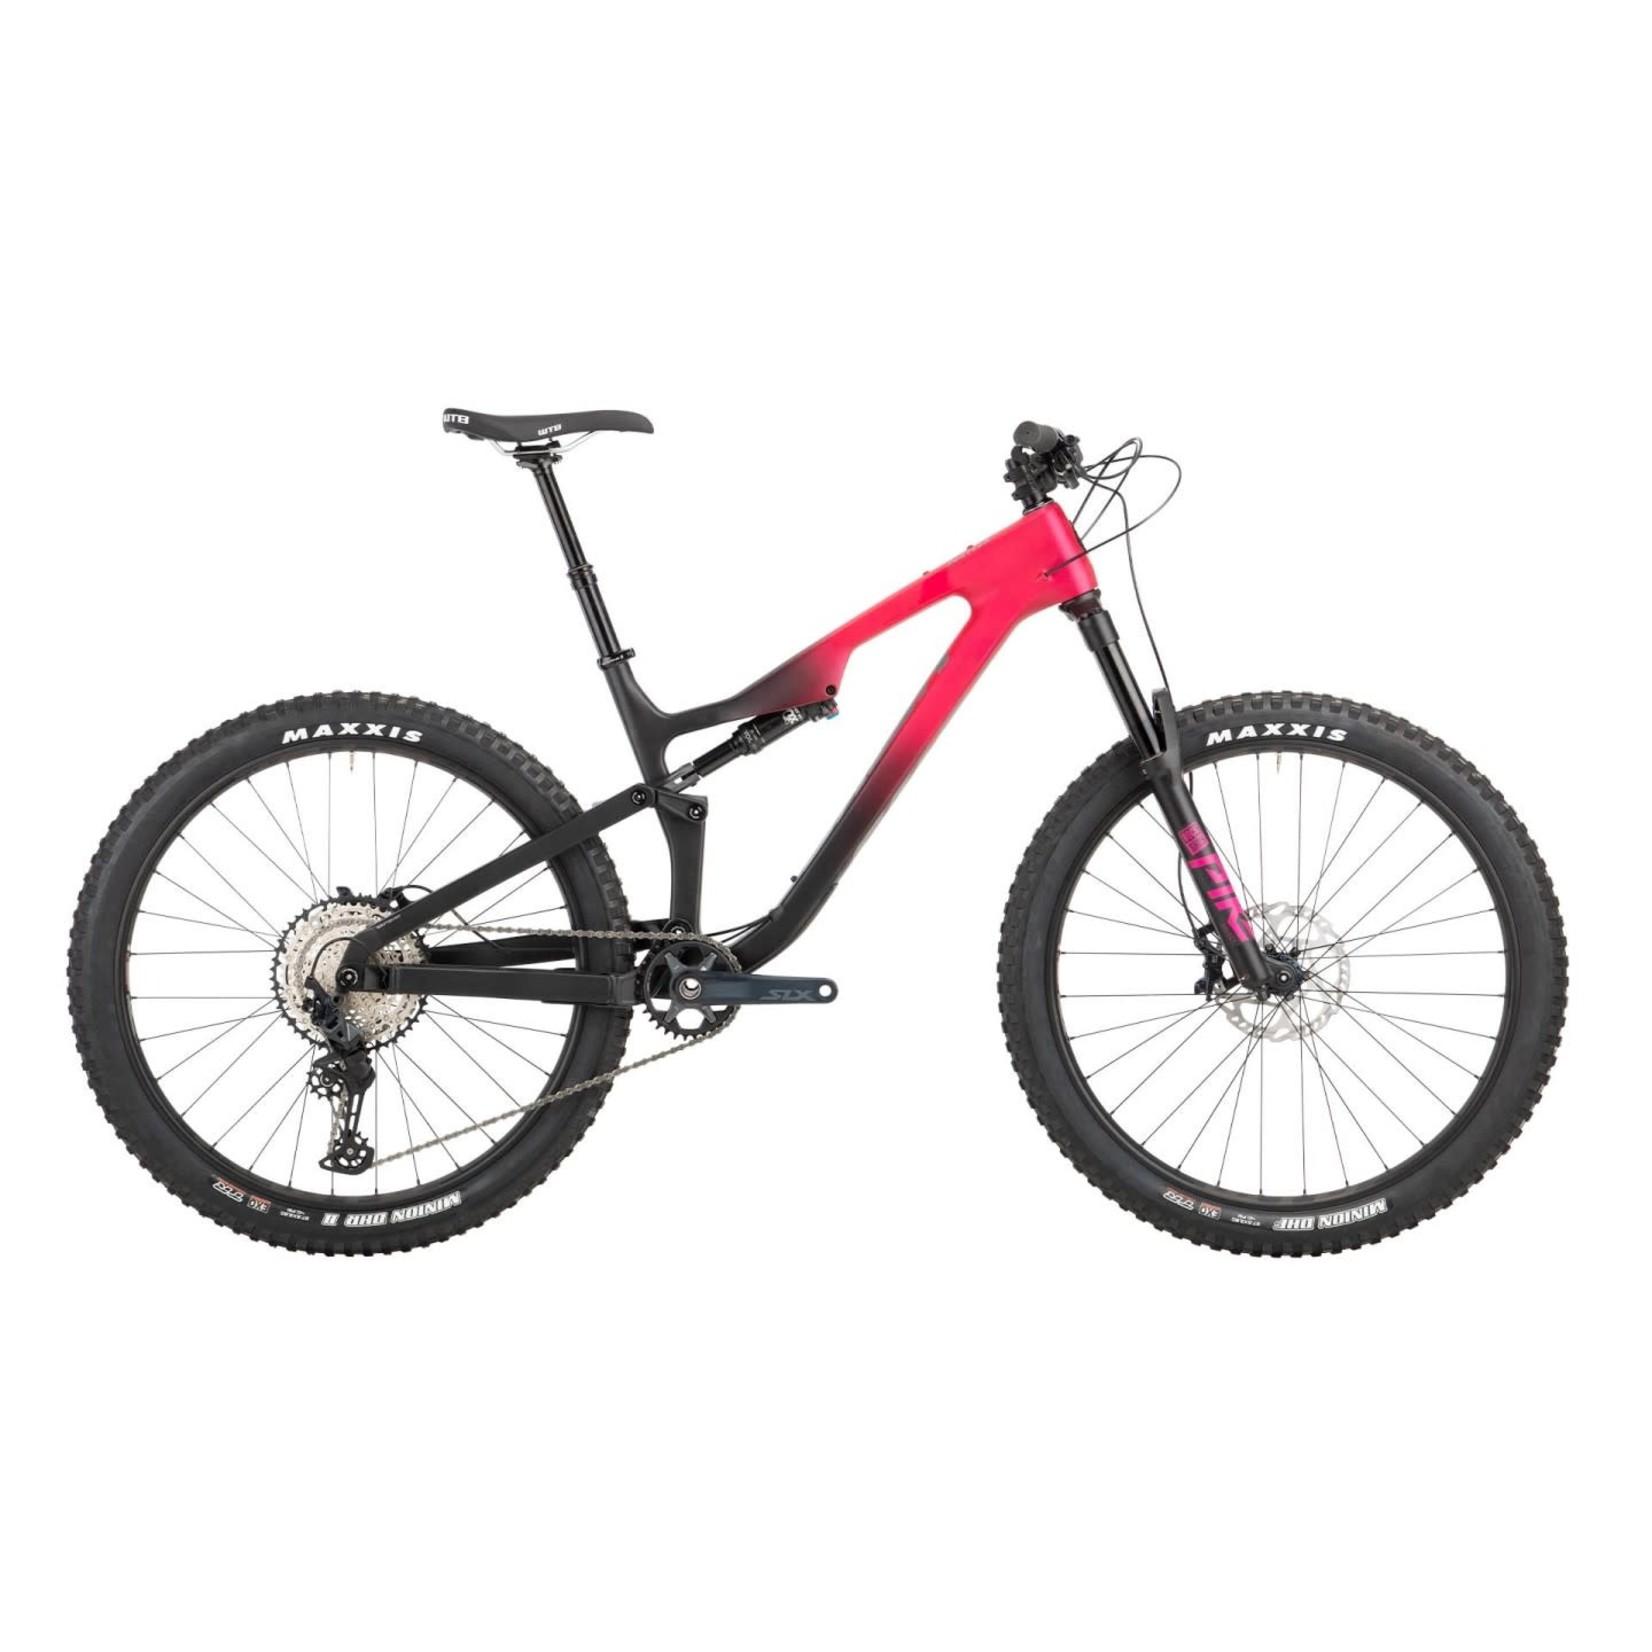 Salsa Salsa Rustler Carbon SLX Bike - 27.5'', Carbon, Pink/Black Fade, Small